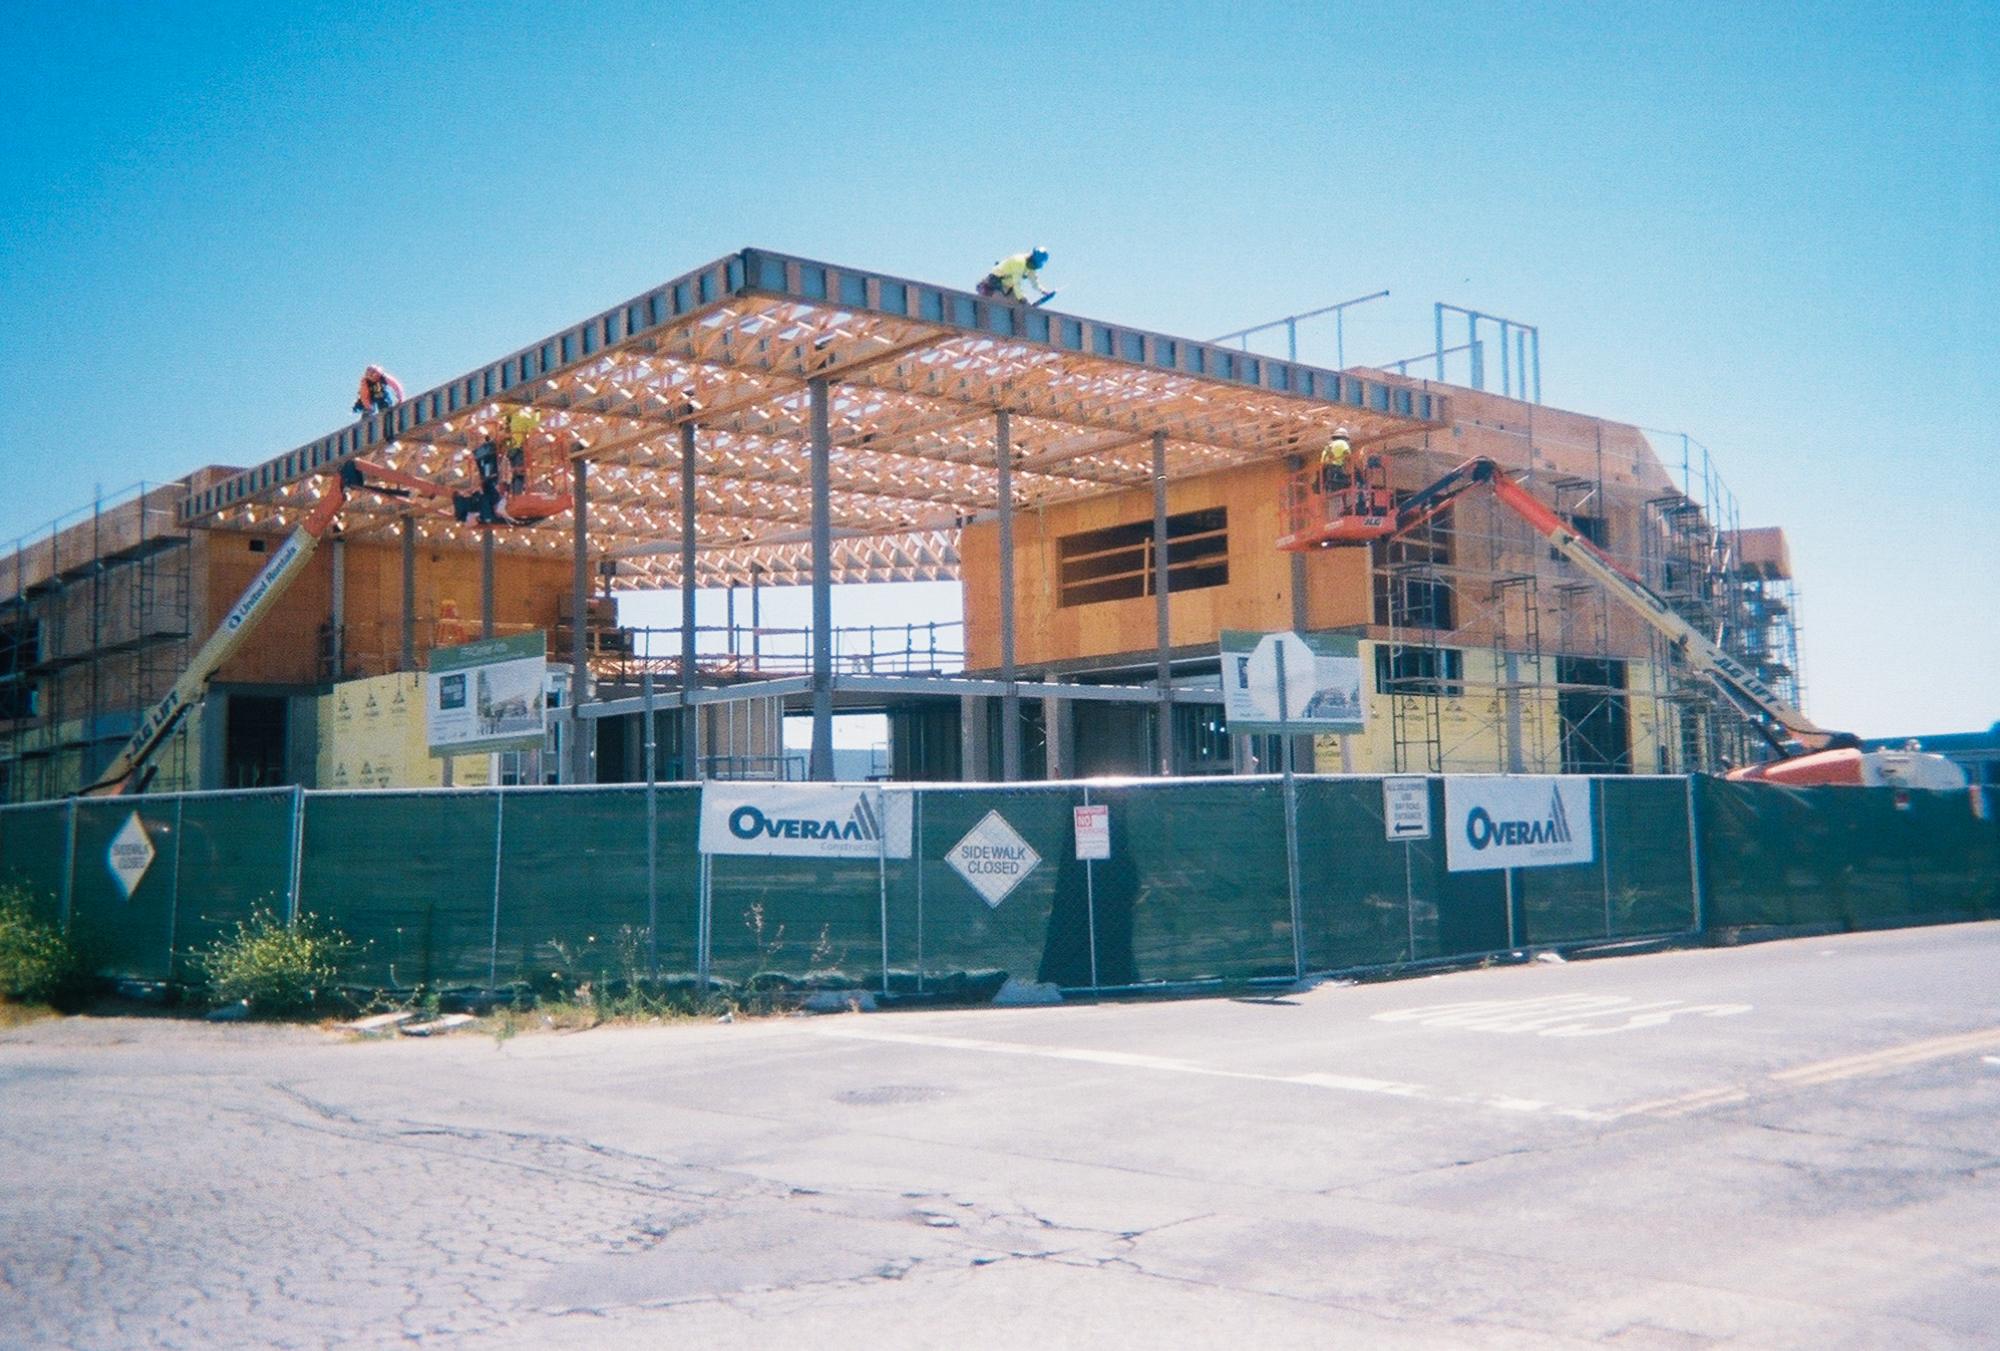 A construction site shows the changing landscape of East Palo Alto. (Photo by Selijah Meacham.)